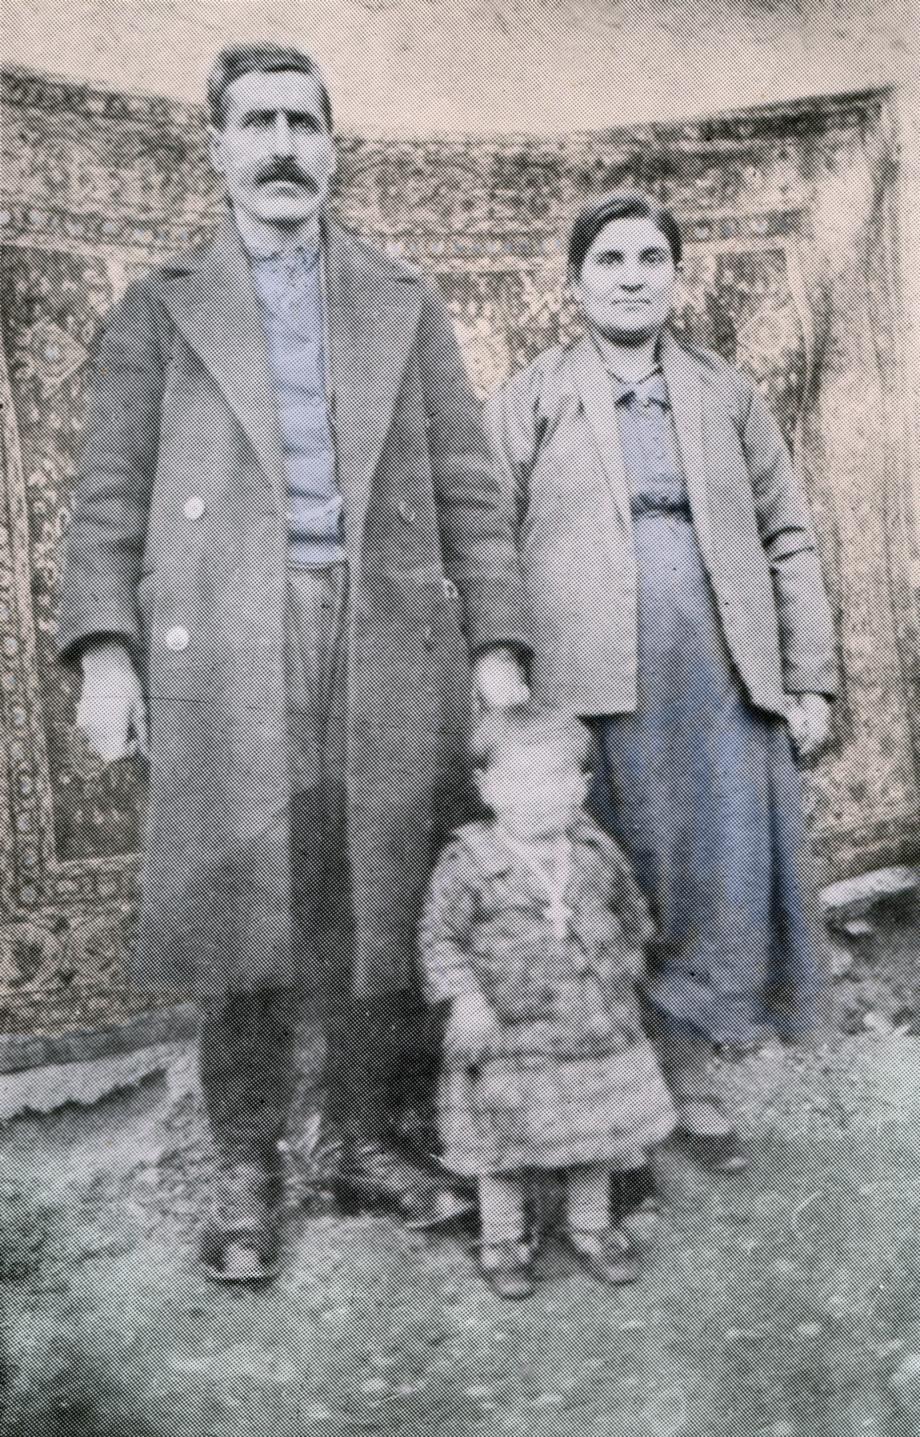 Melkon Nazarian (from Agn), his wife Nazeni, and their son, Avedis Nazarian